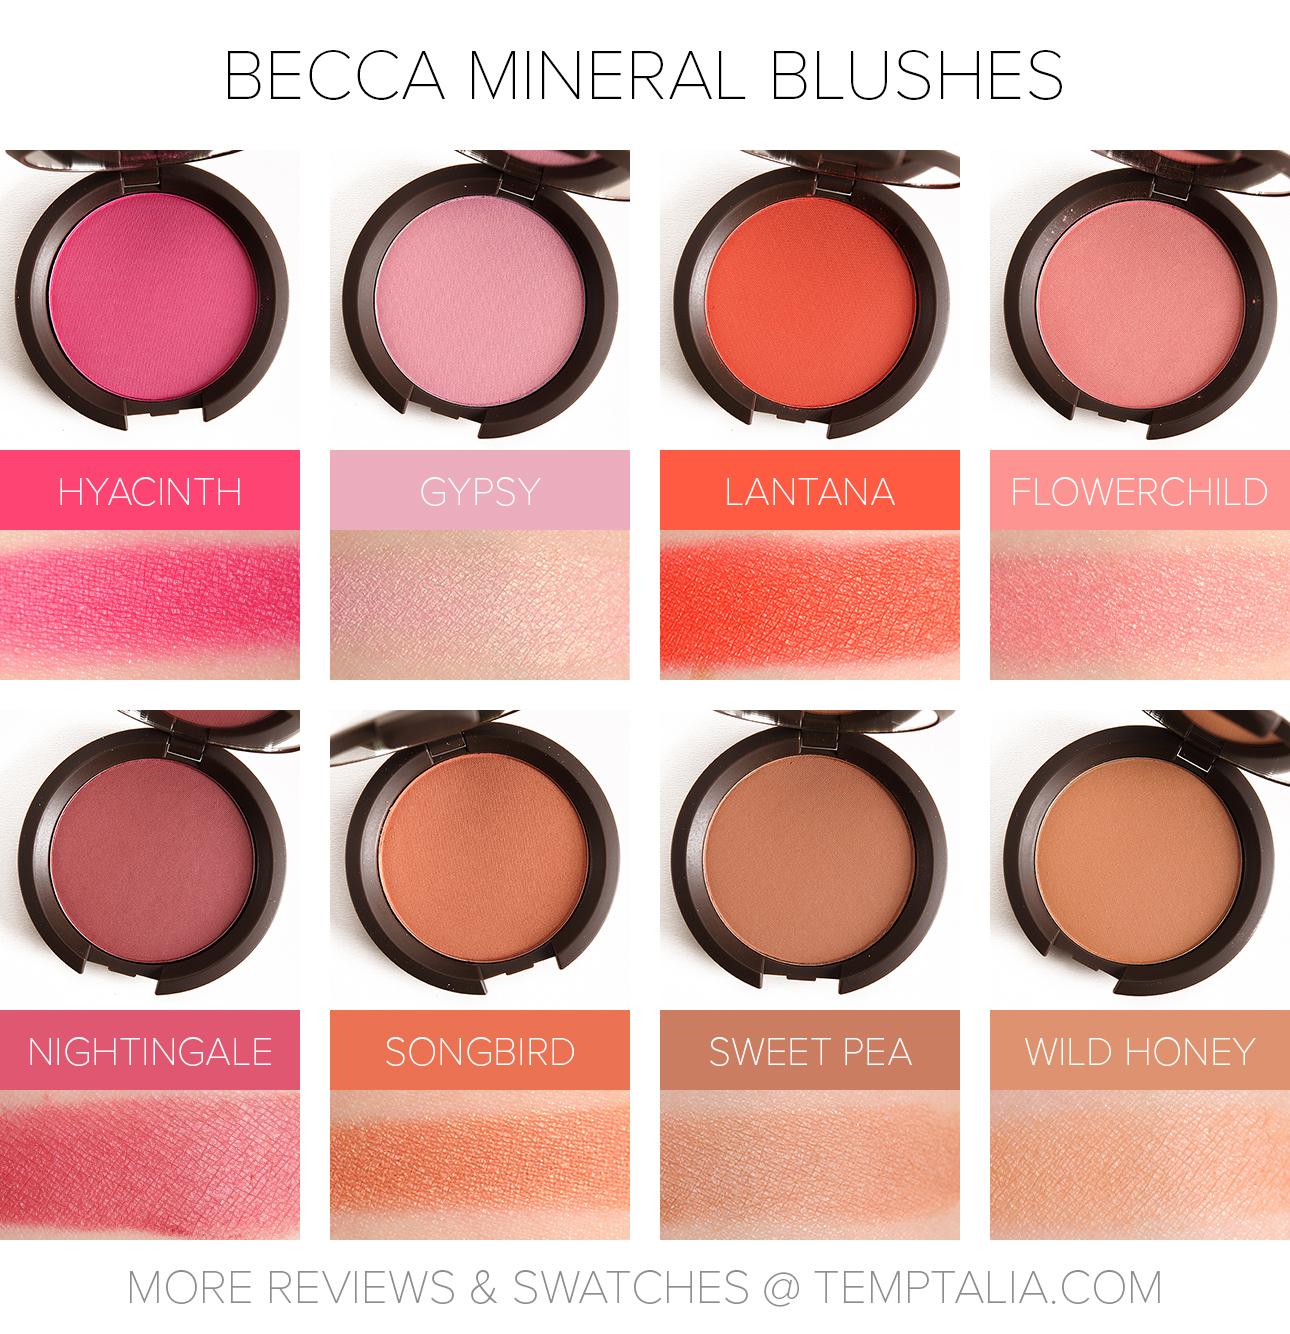 Sneak Peek: Becca Mineral Blushes Photos & Swatches